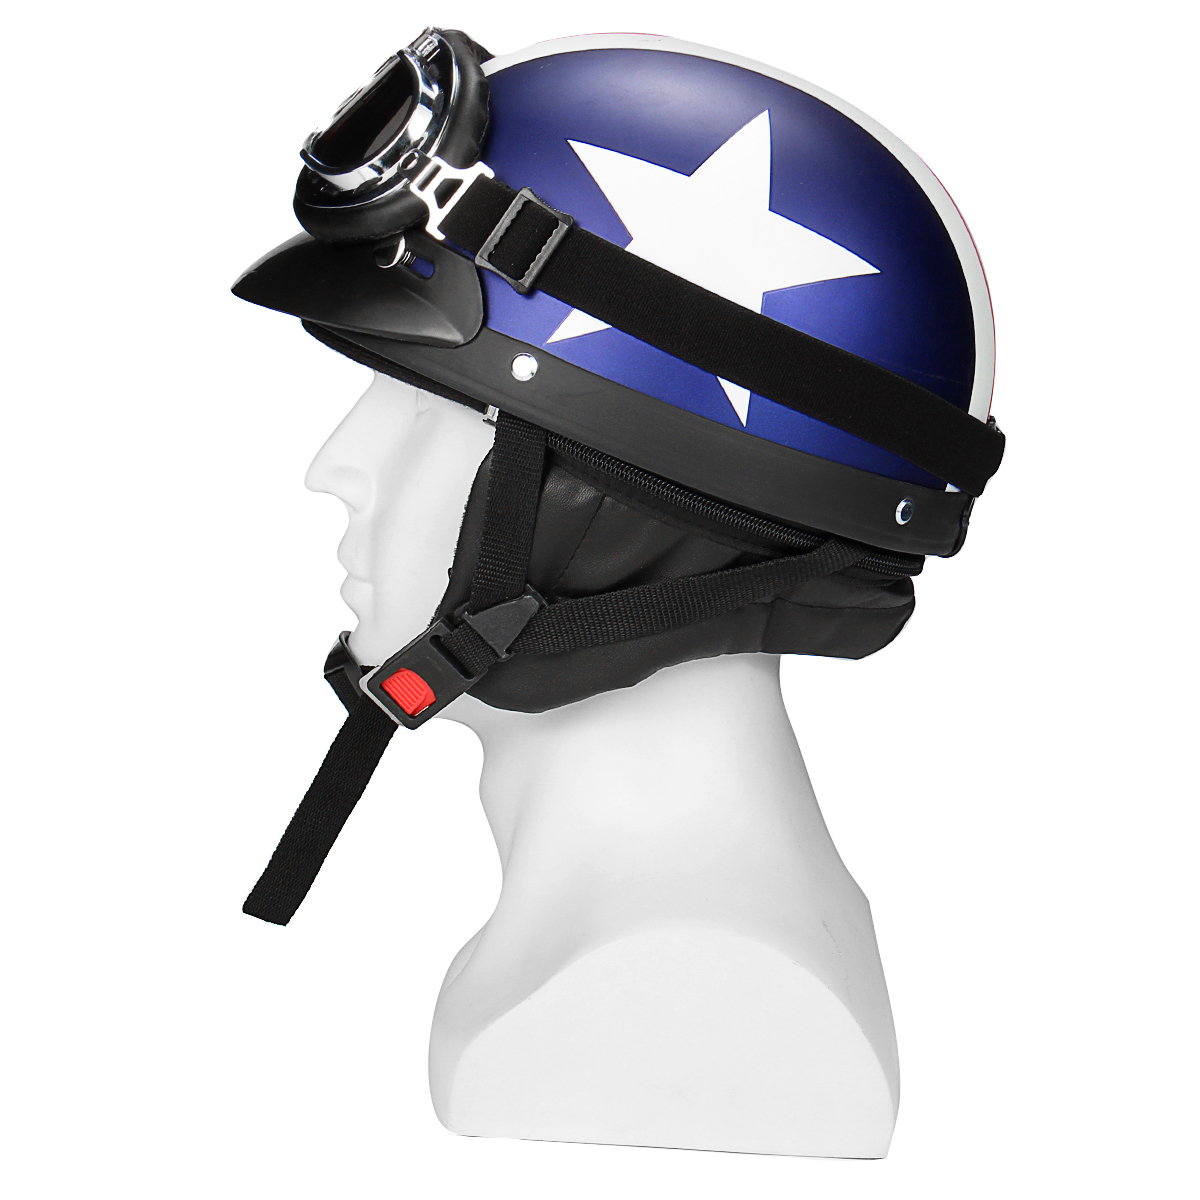 Retro White Star Motorcycle Half Face Helmet Biker Scooter With Sun Visor UV Goggles Cafe Racer